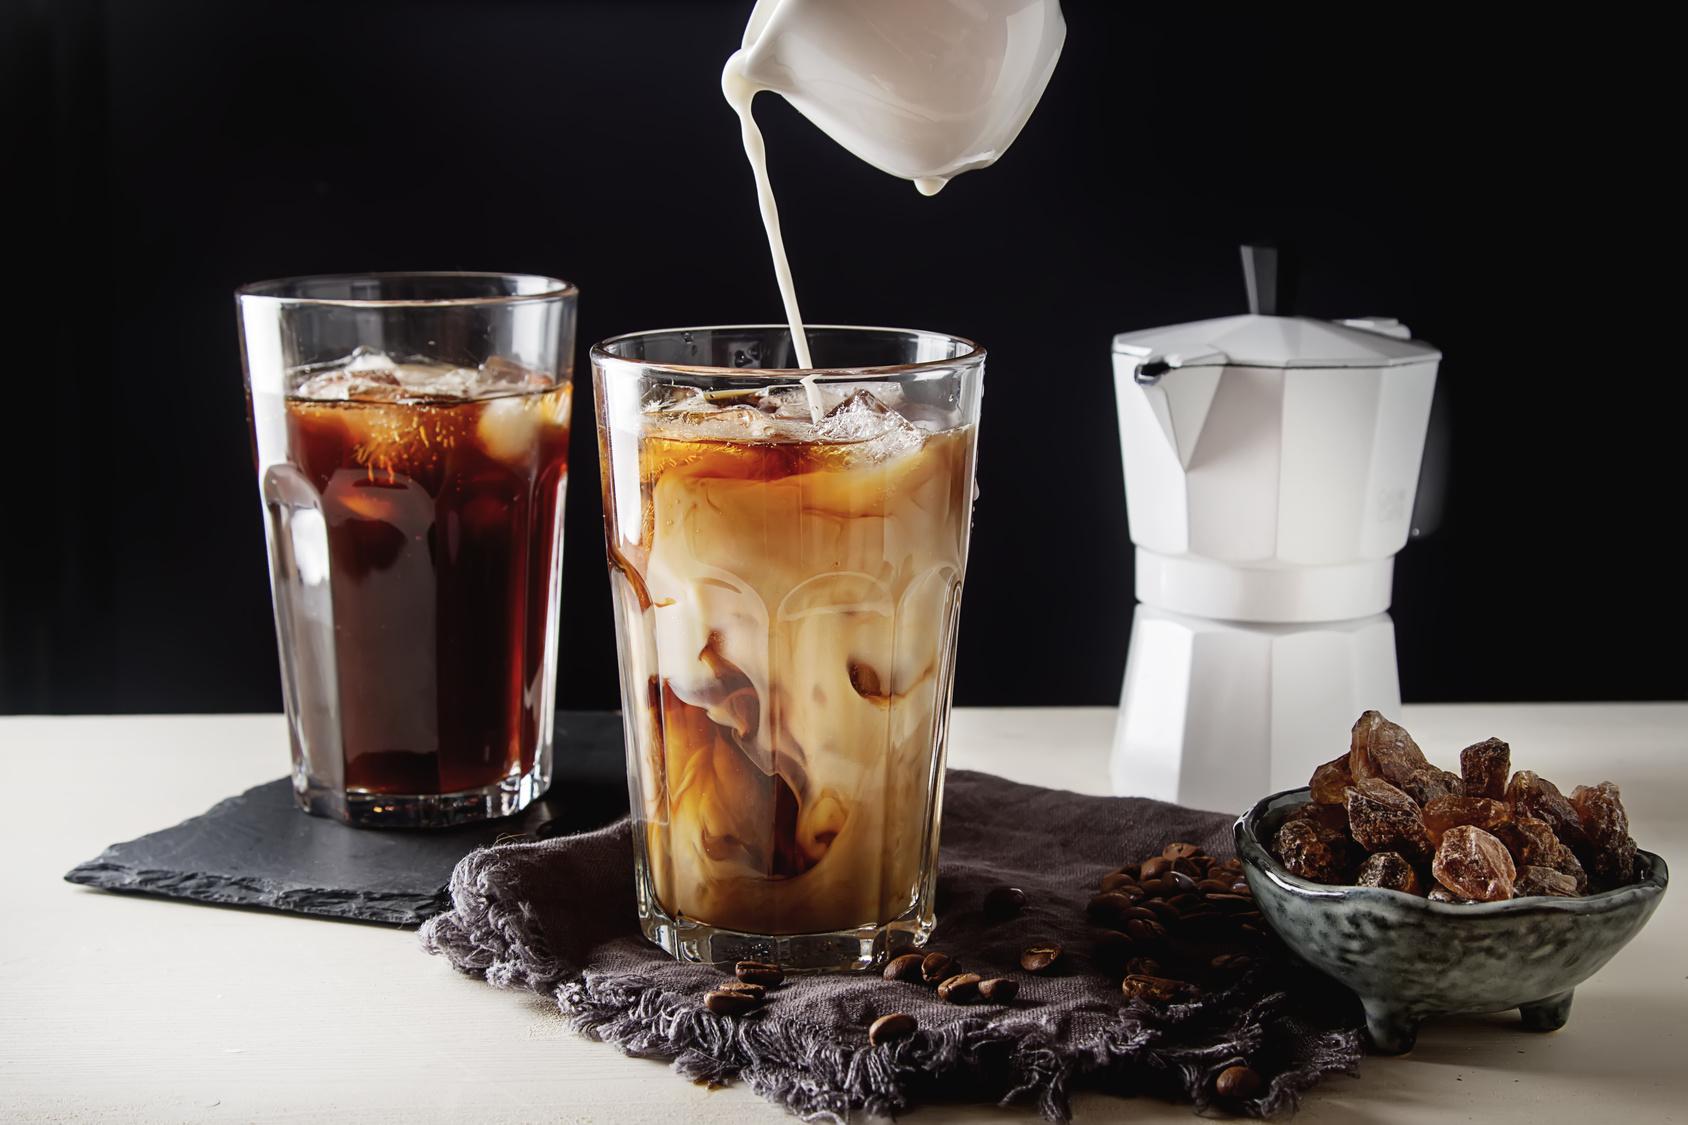 wachmacher mal anders kaffee variationen mit alkohol. Black Bedroom Furniture Sets. Home Design Ideas